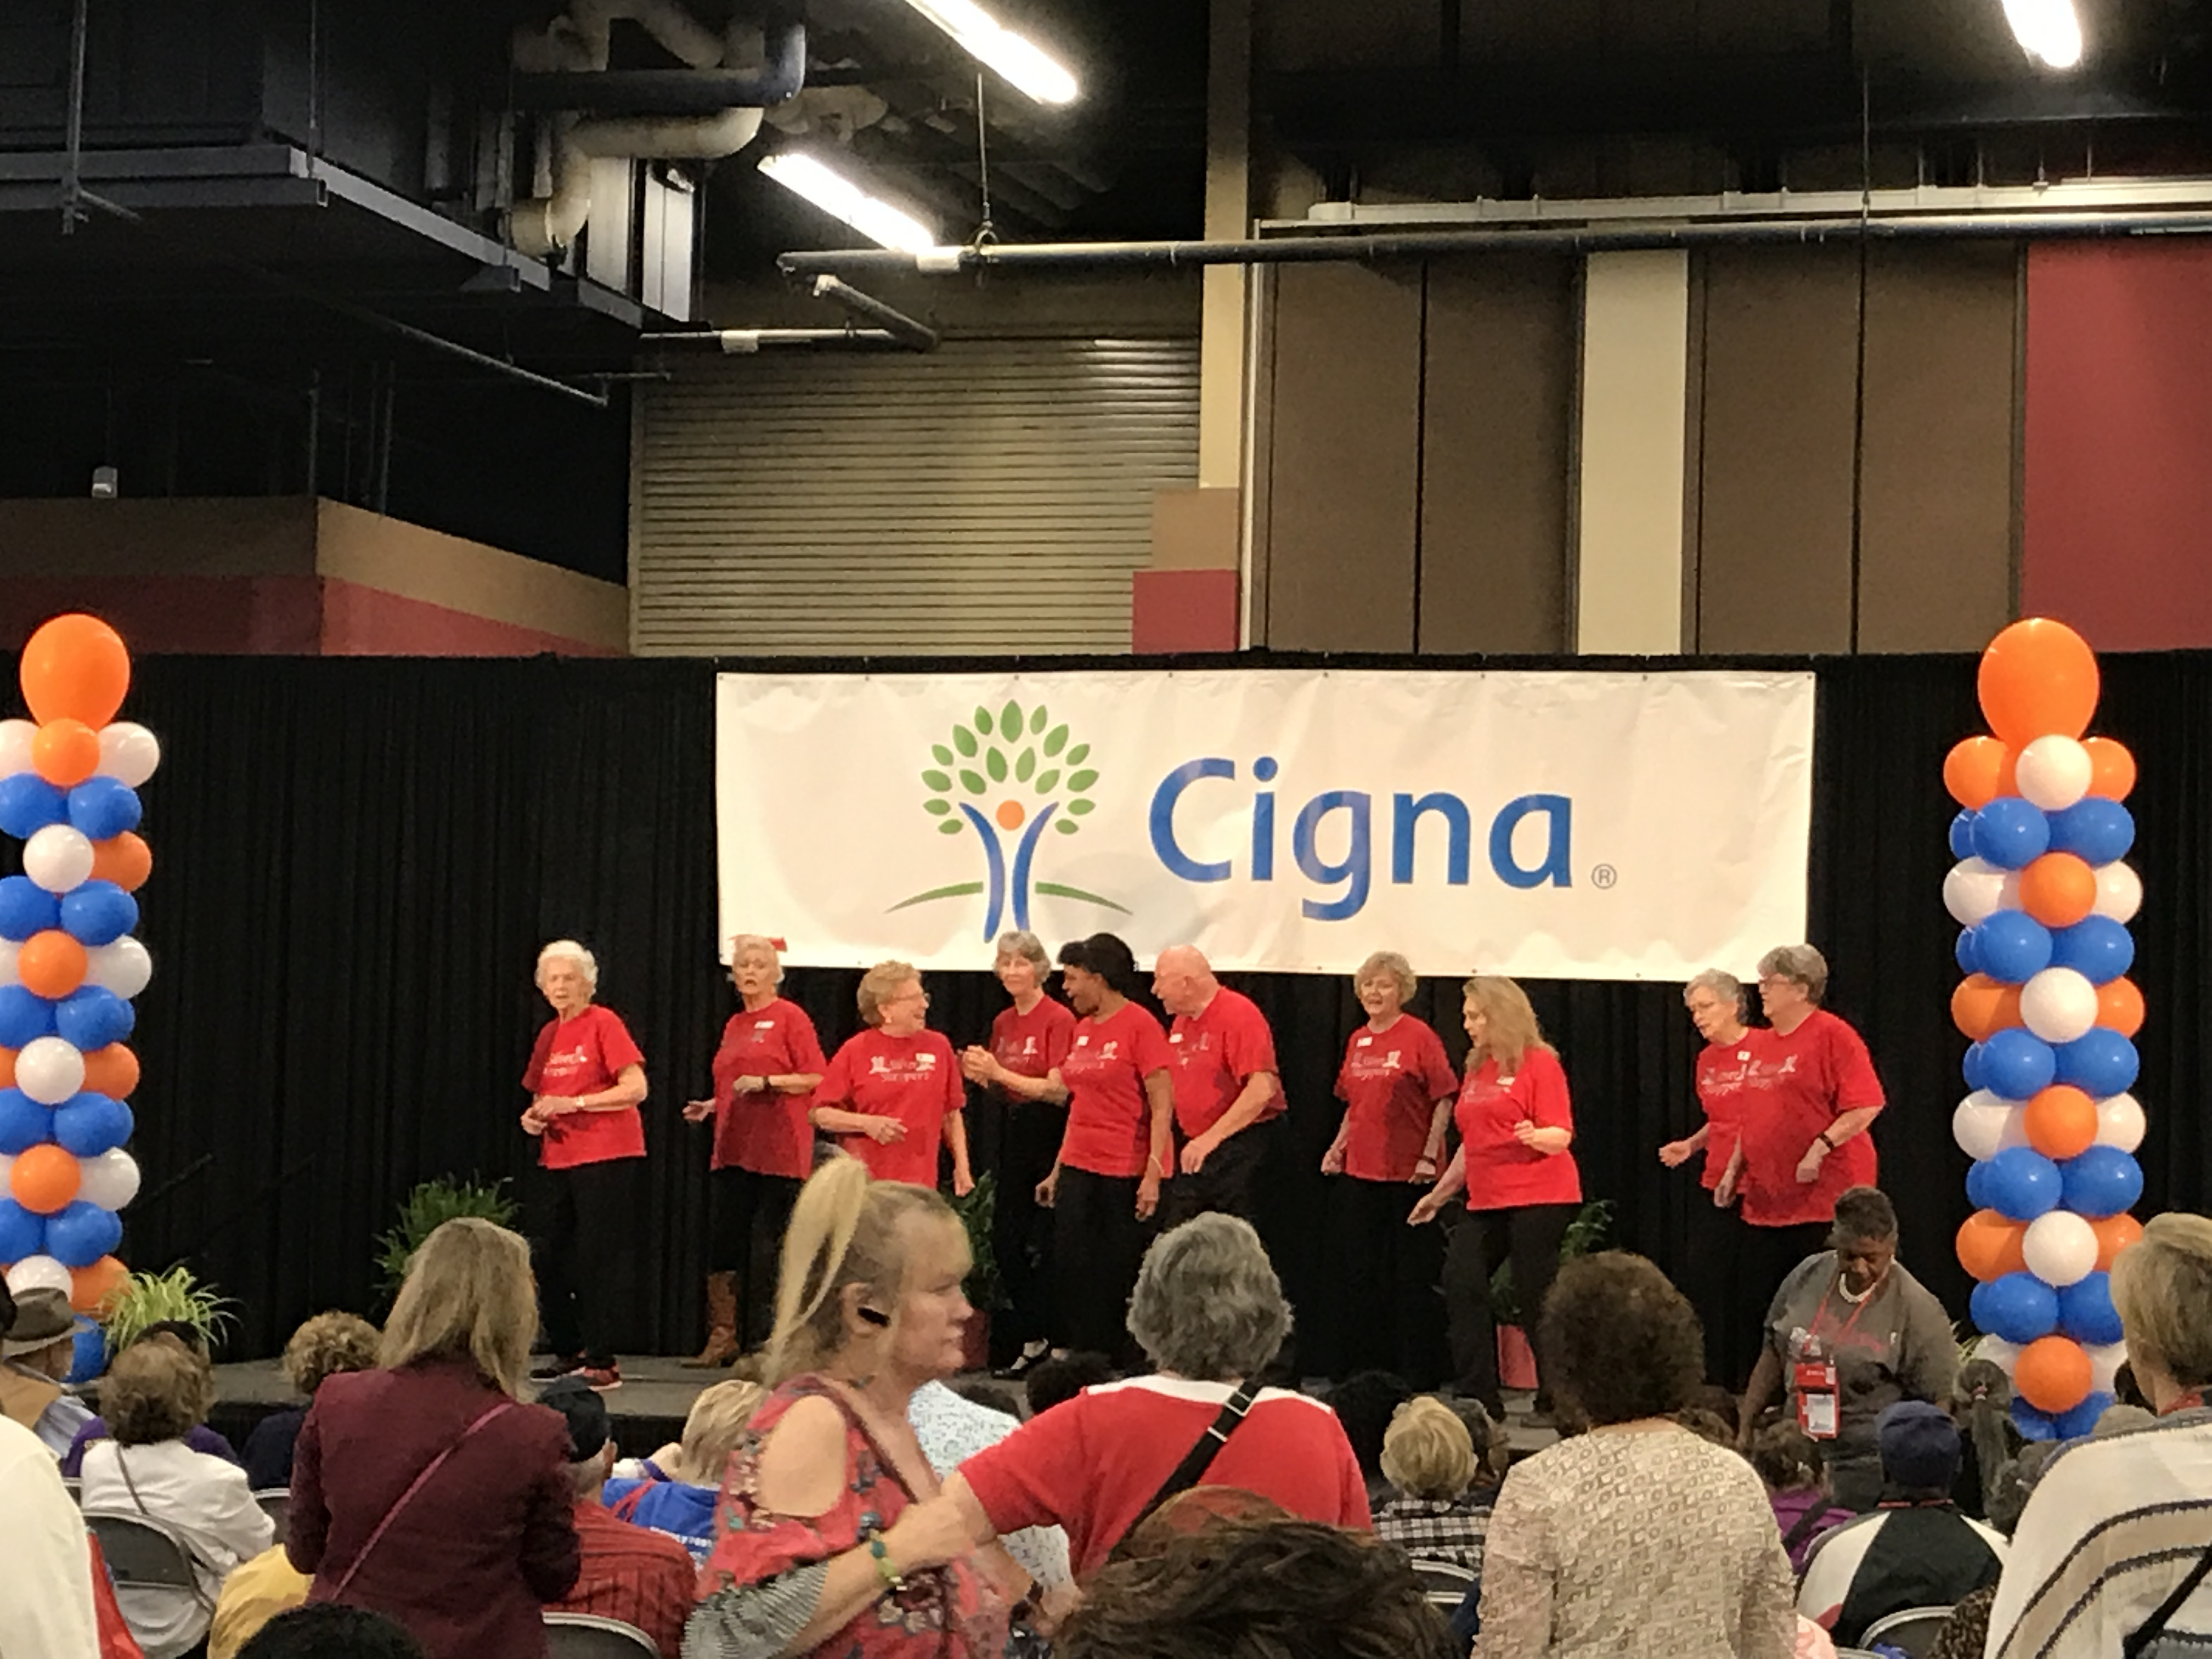 Cigna - ACG Medical Supply